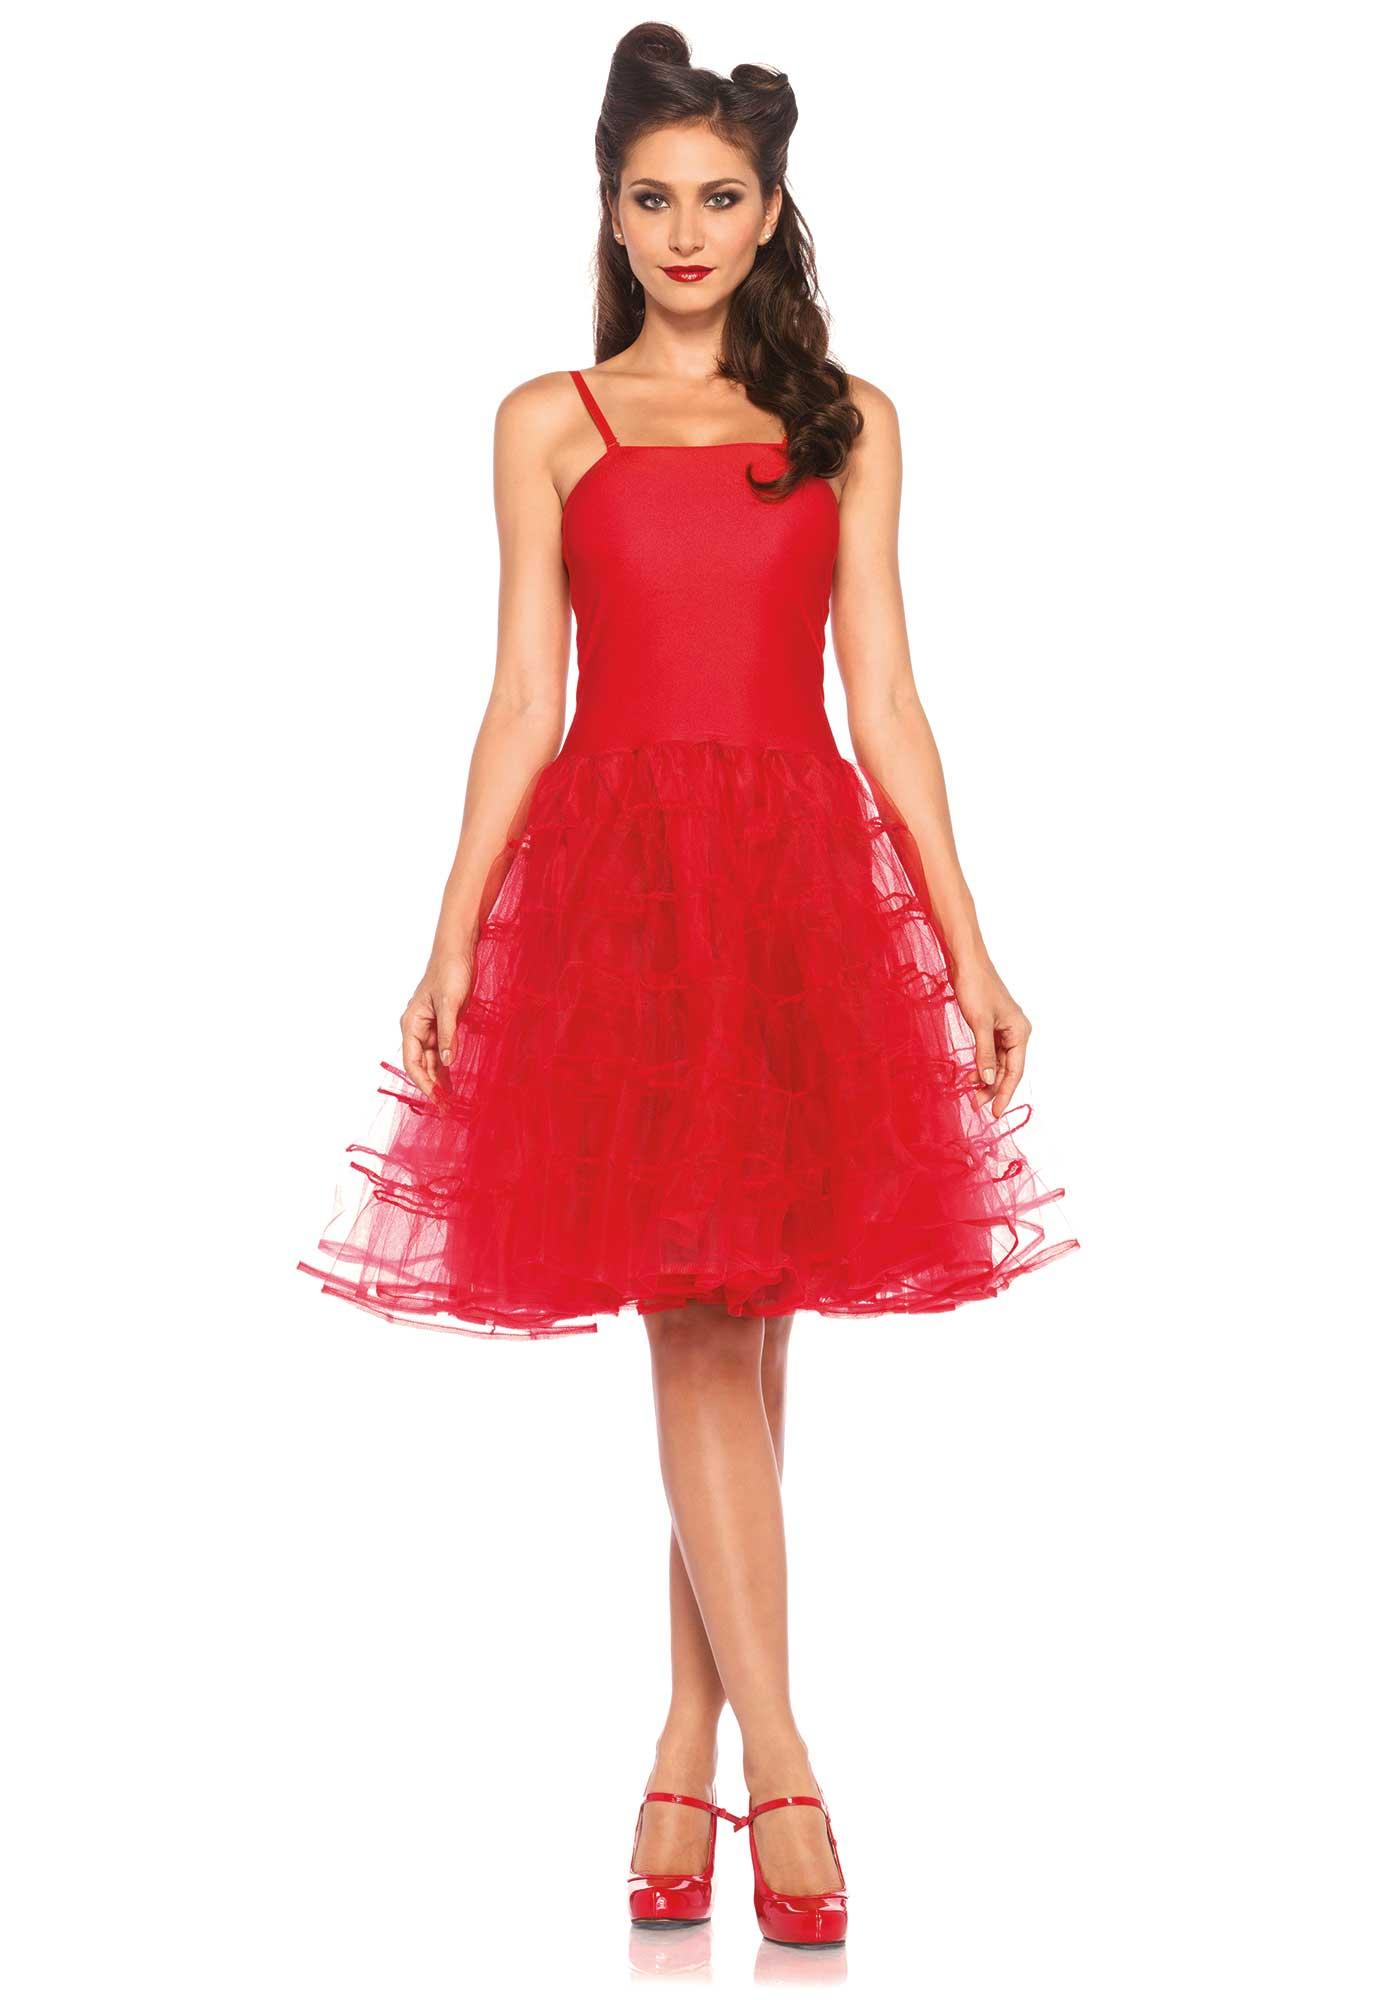 d guisement robe rouge ann es 50 femme deguise toi. Black Bedroom Furniture Sets. Home Design Ideas